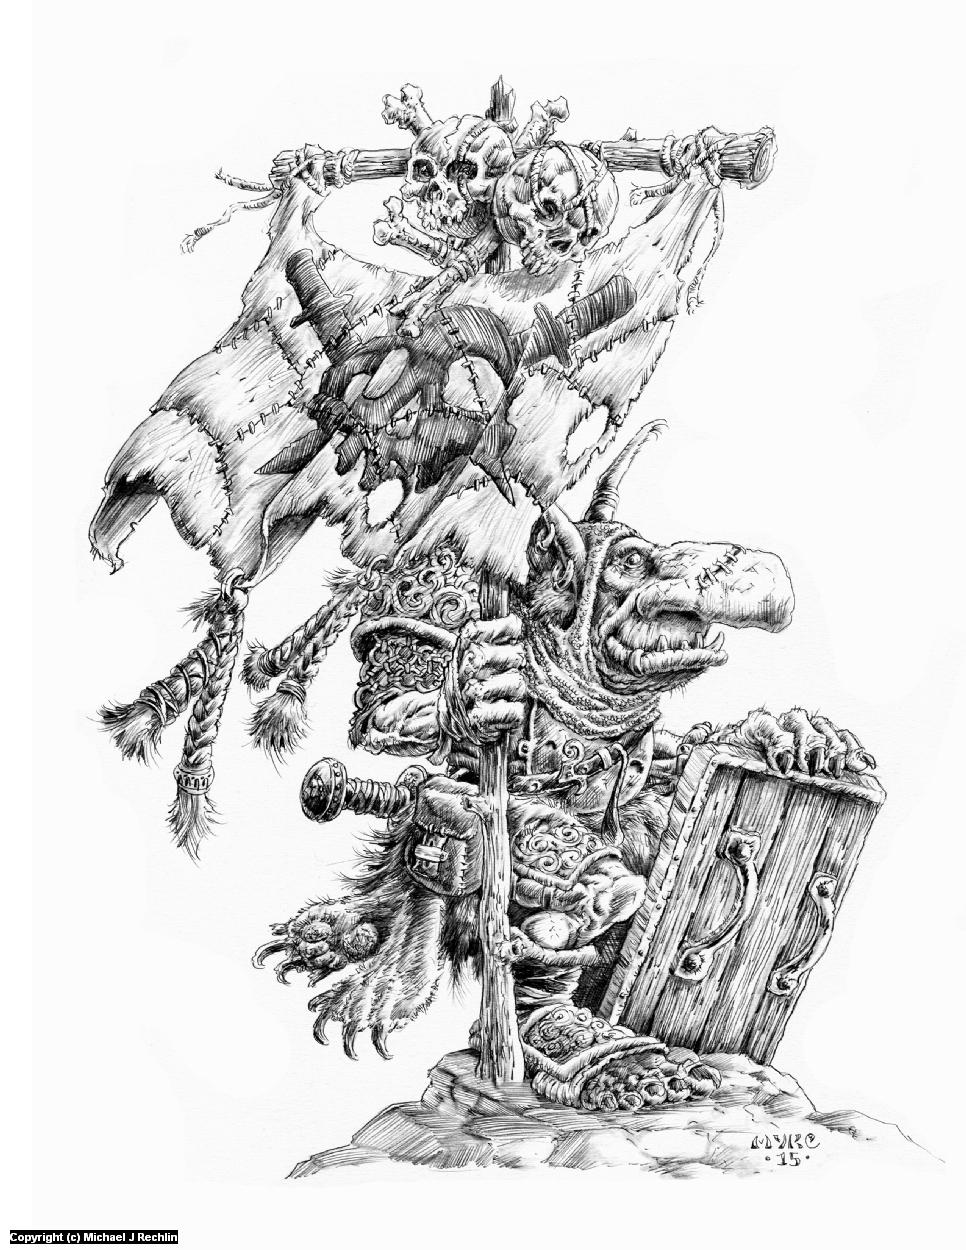 Goblin Standard Bearer Artwork by Michael Rechlin